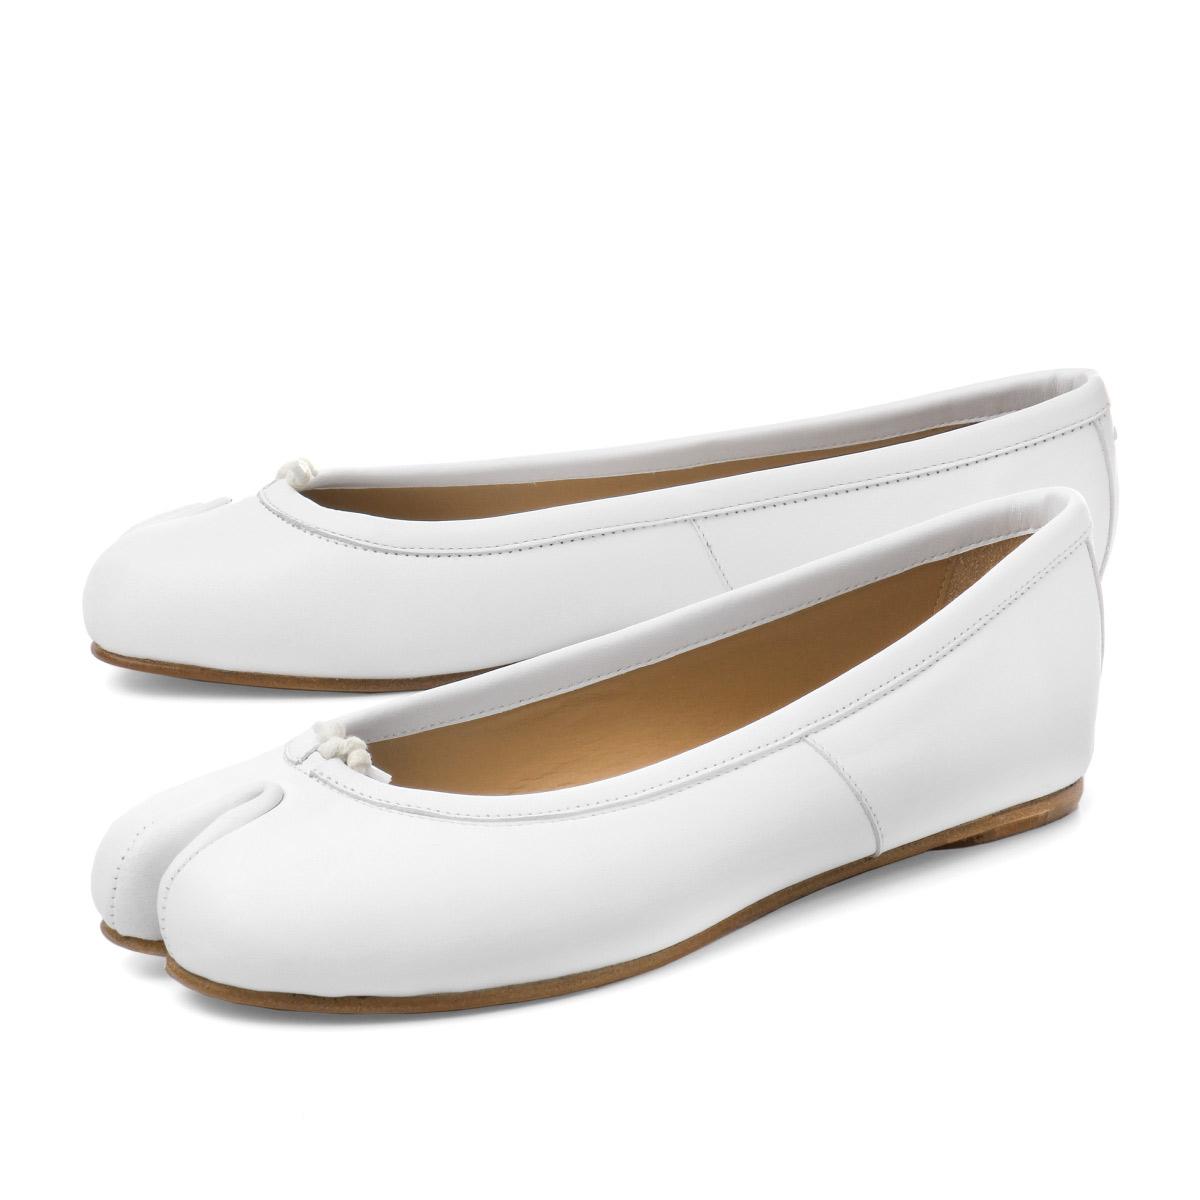 c2eecdfde23 importshopdouble: メゾンマルジェラ MAISON MARGIELA shoes Lady's S58WZ0046 PR516  T1003 line 22 ballet shoes TABI タビ WHITE white | Rakuten Global Market